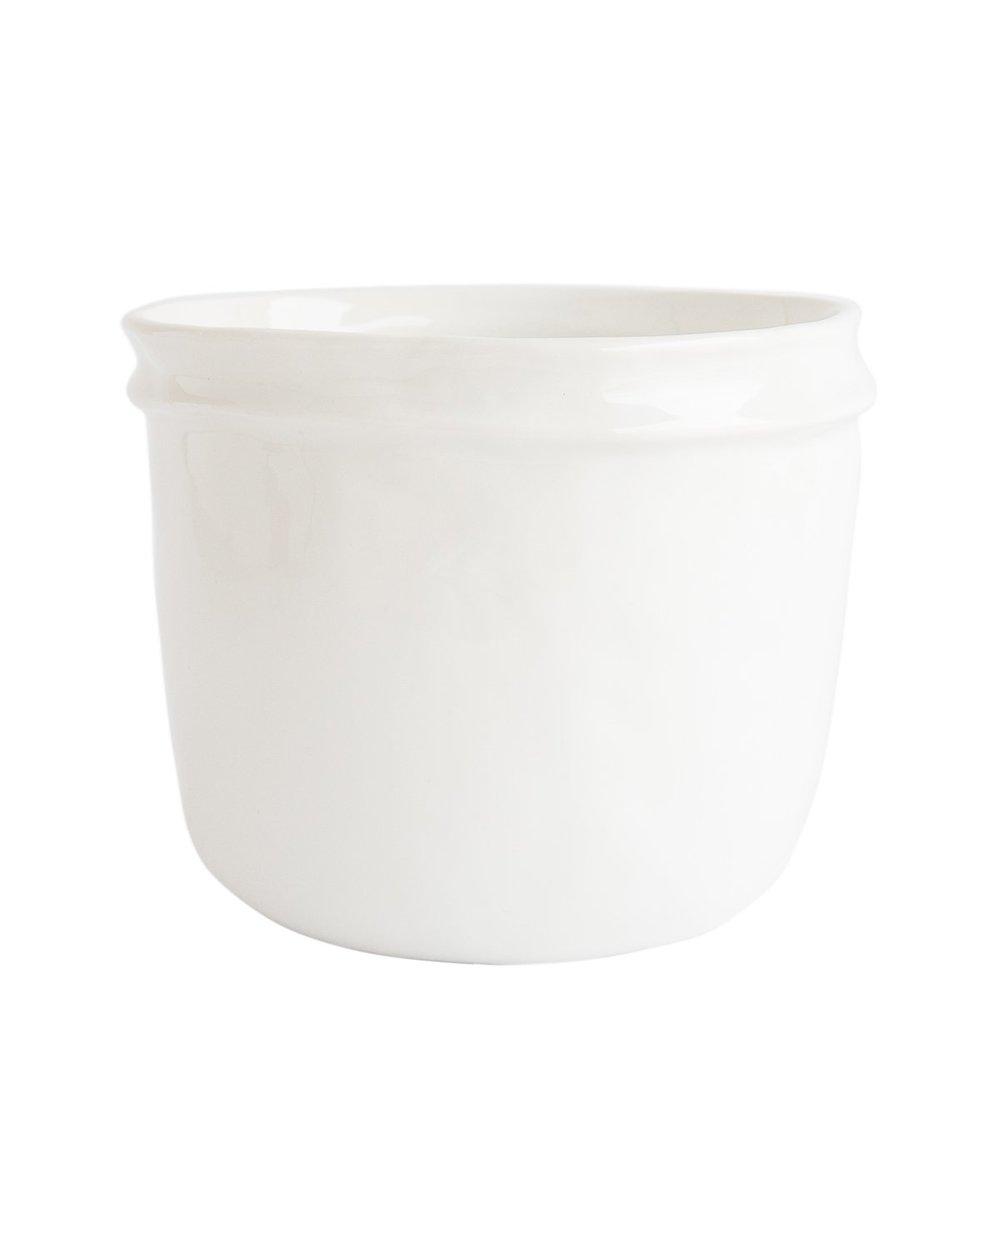 Classic_White_Bowl_1.jpg